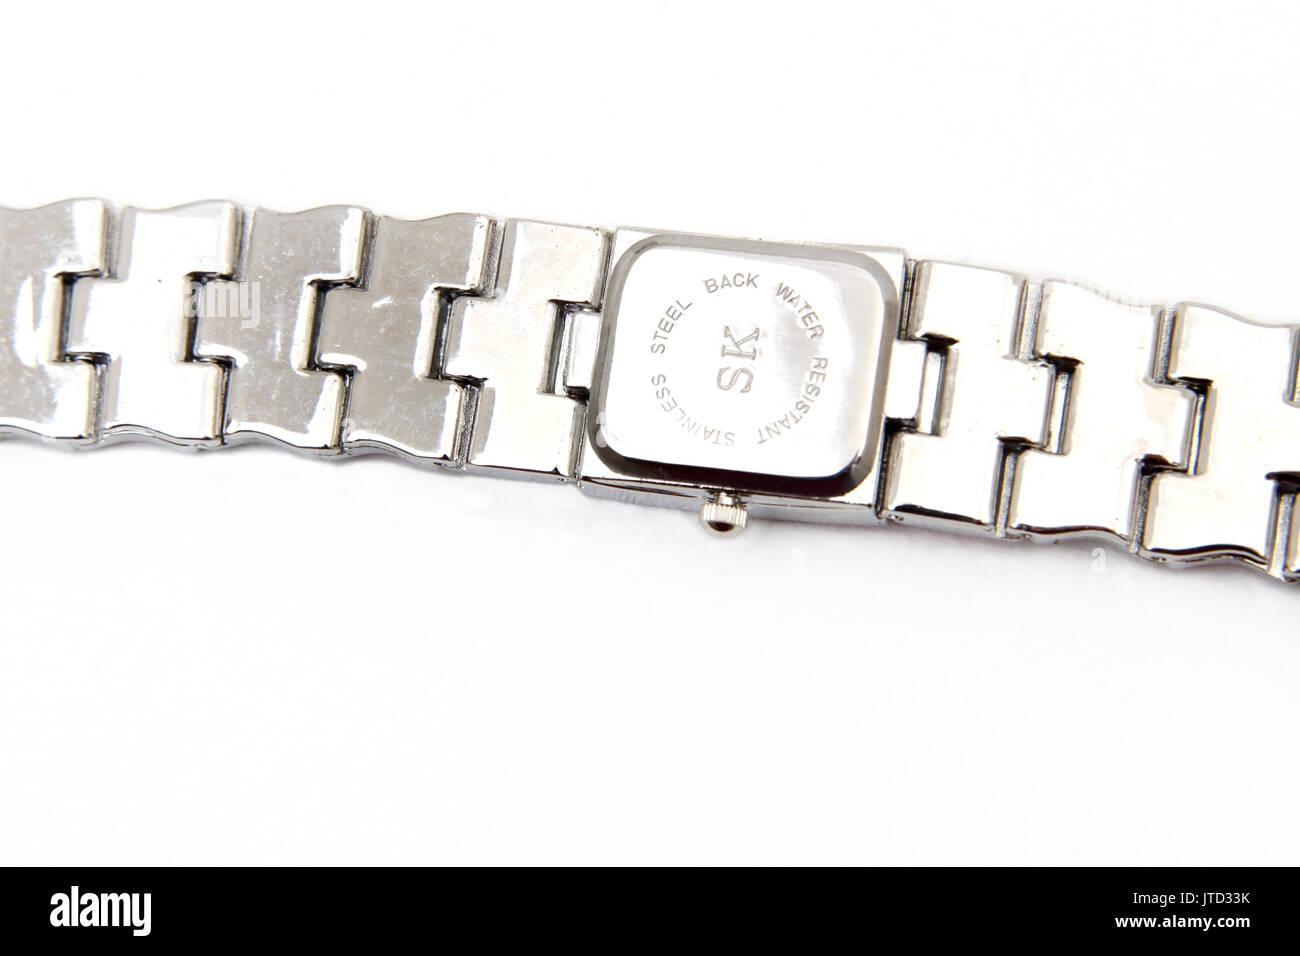 Back of Stainless Steel and Enamel  SK Shengke Wrist Watch - Stock Image